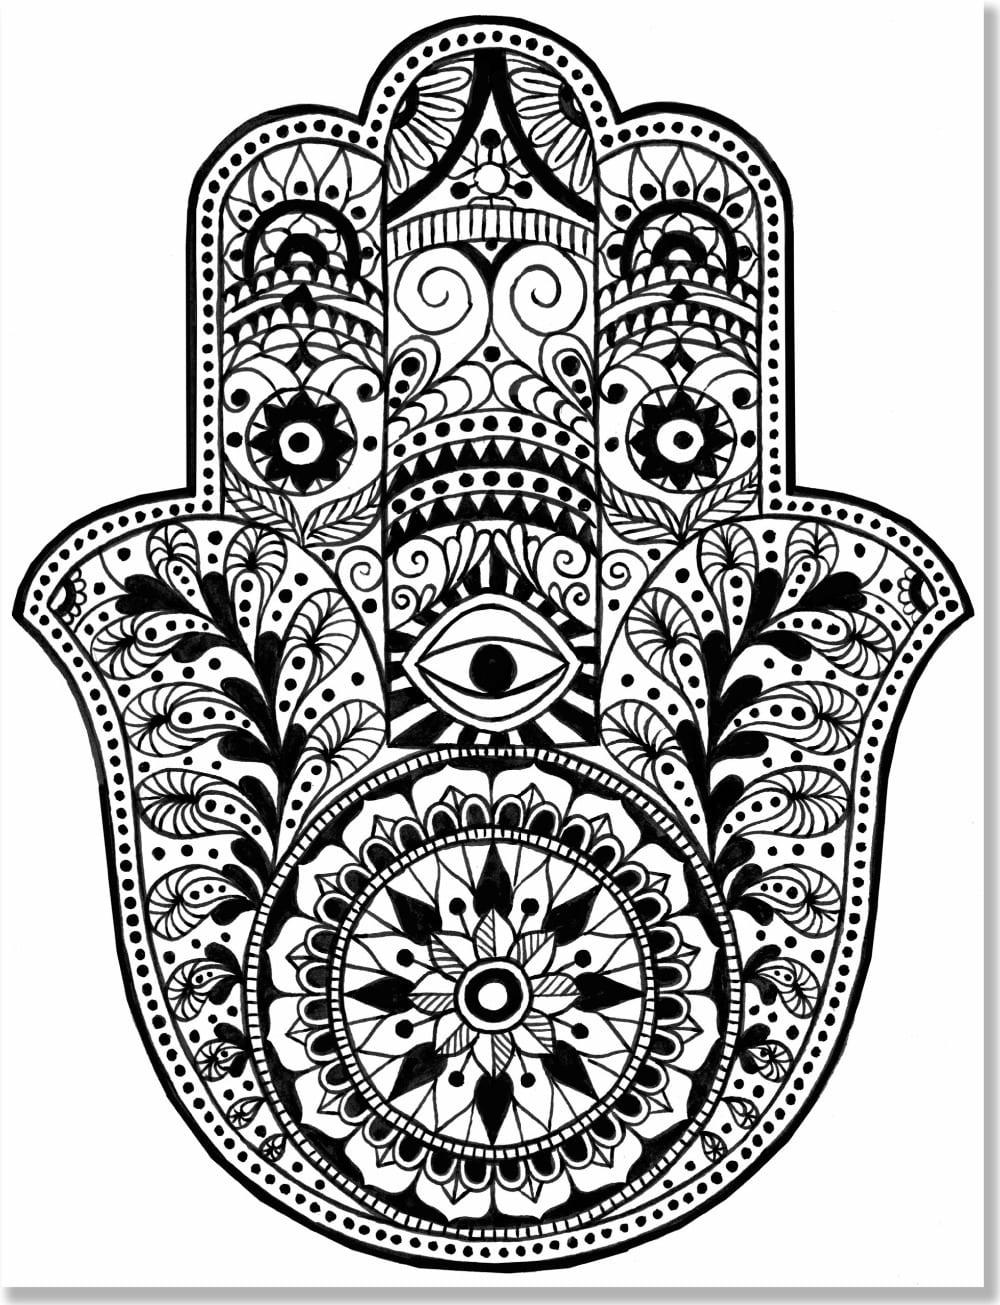 Mandala Designs Coloring Book (31 Stress Relieving Designs